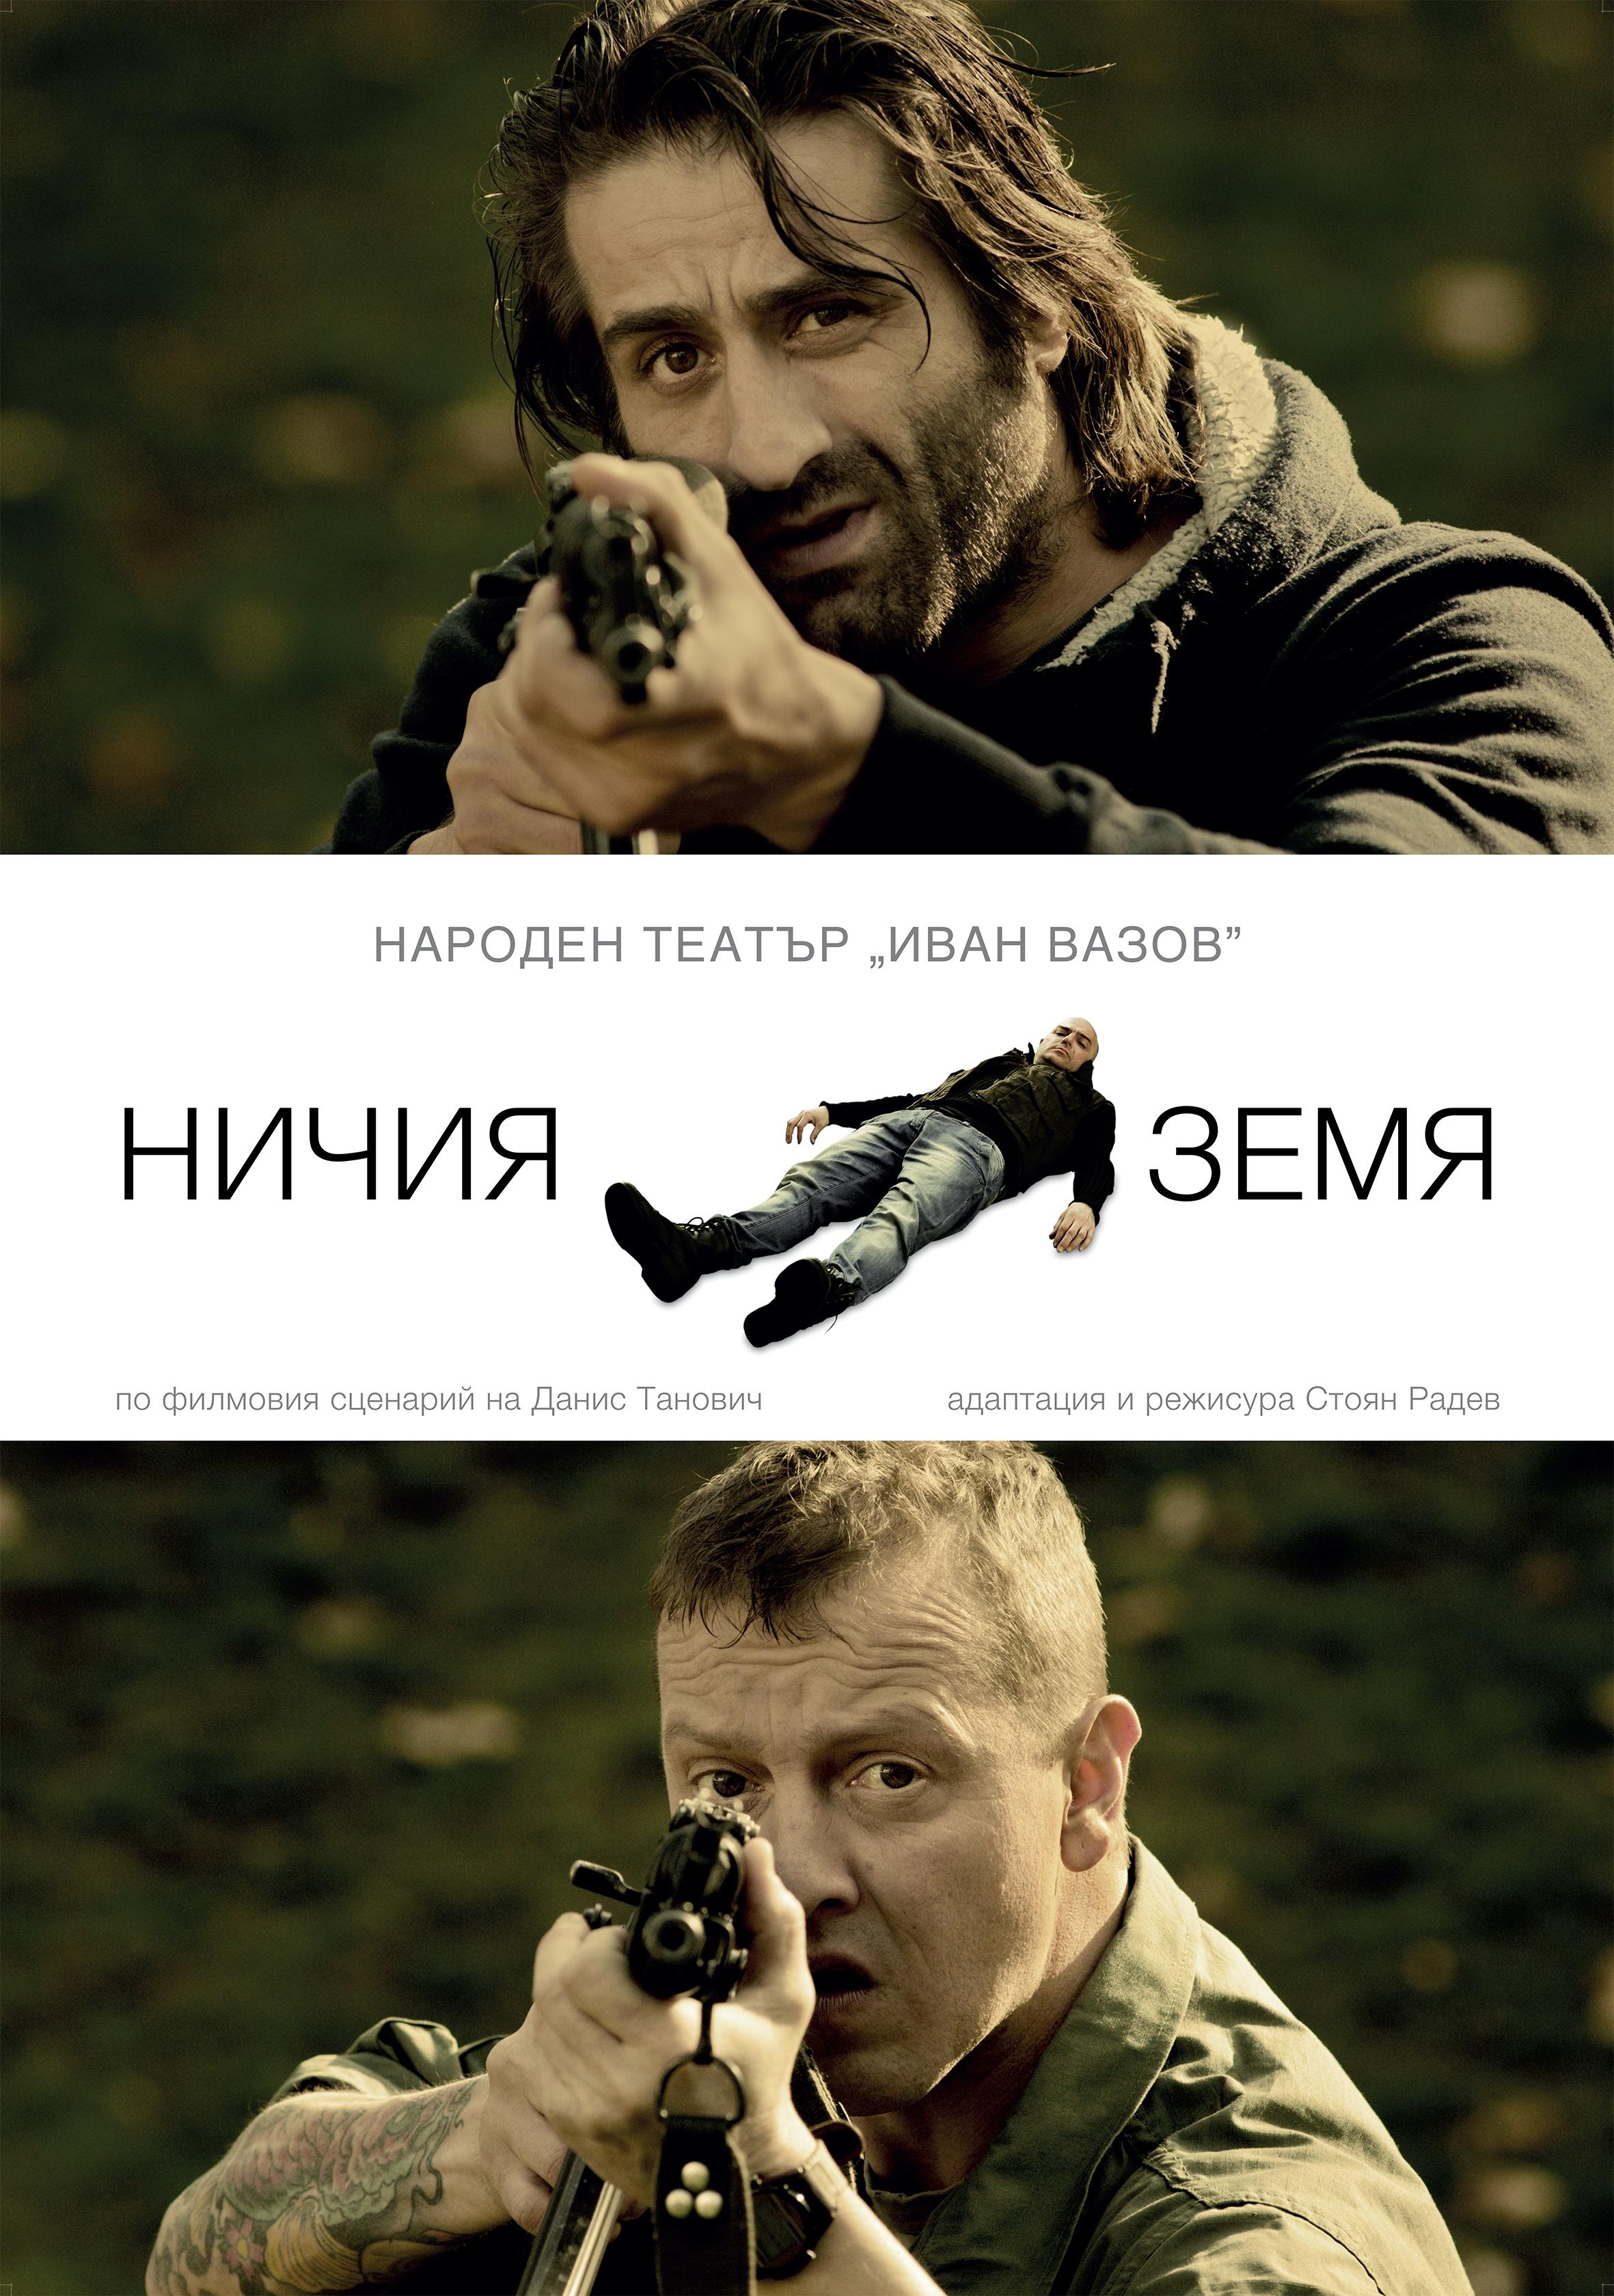 Филип Аврамов и Валери Йорданов